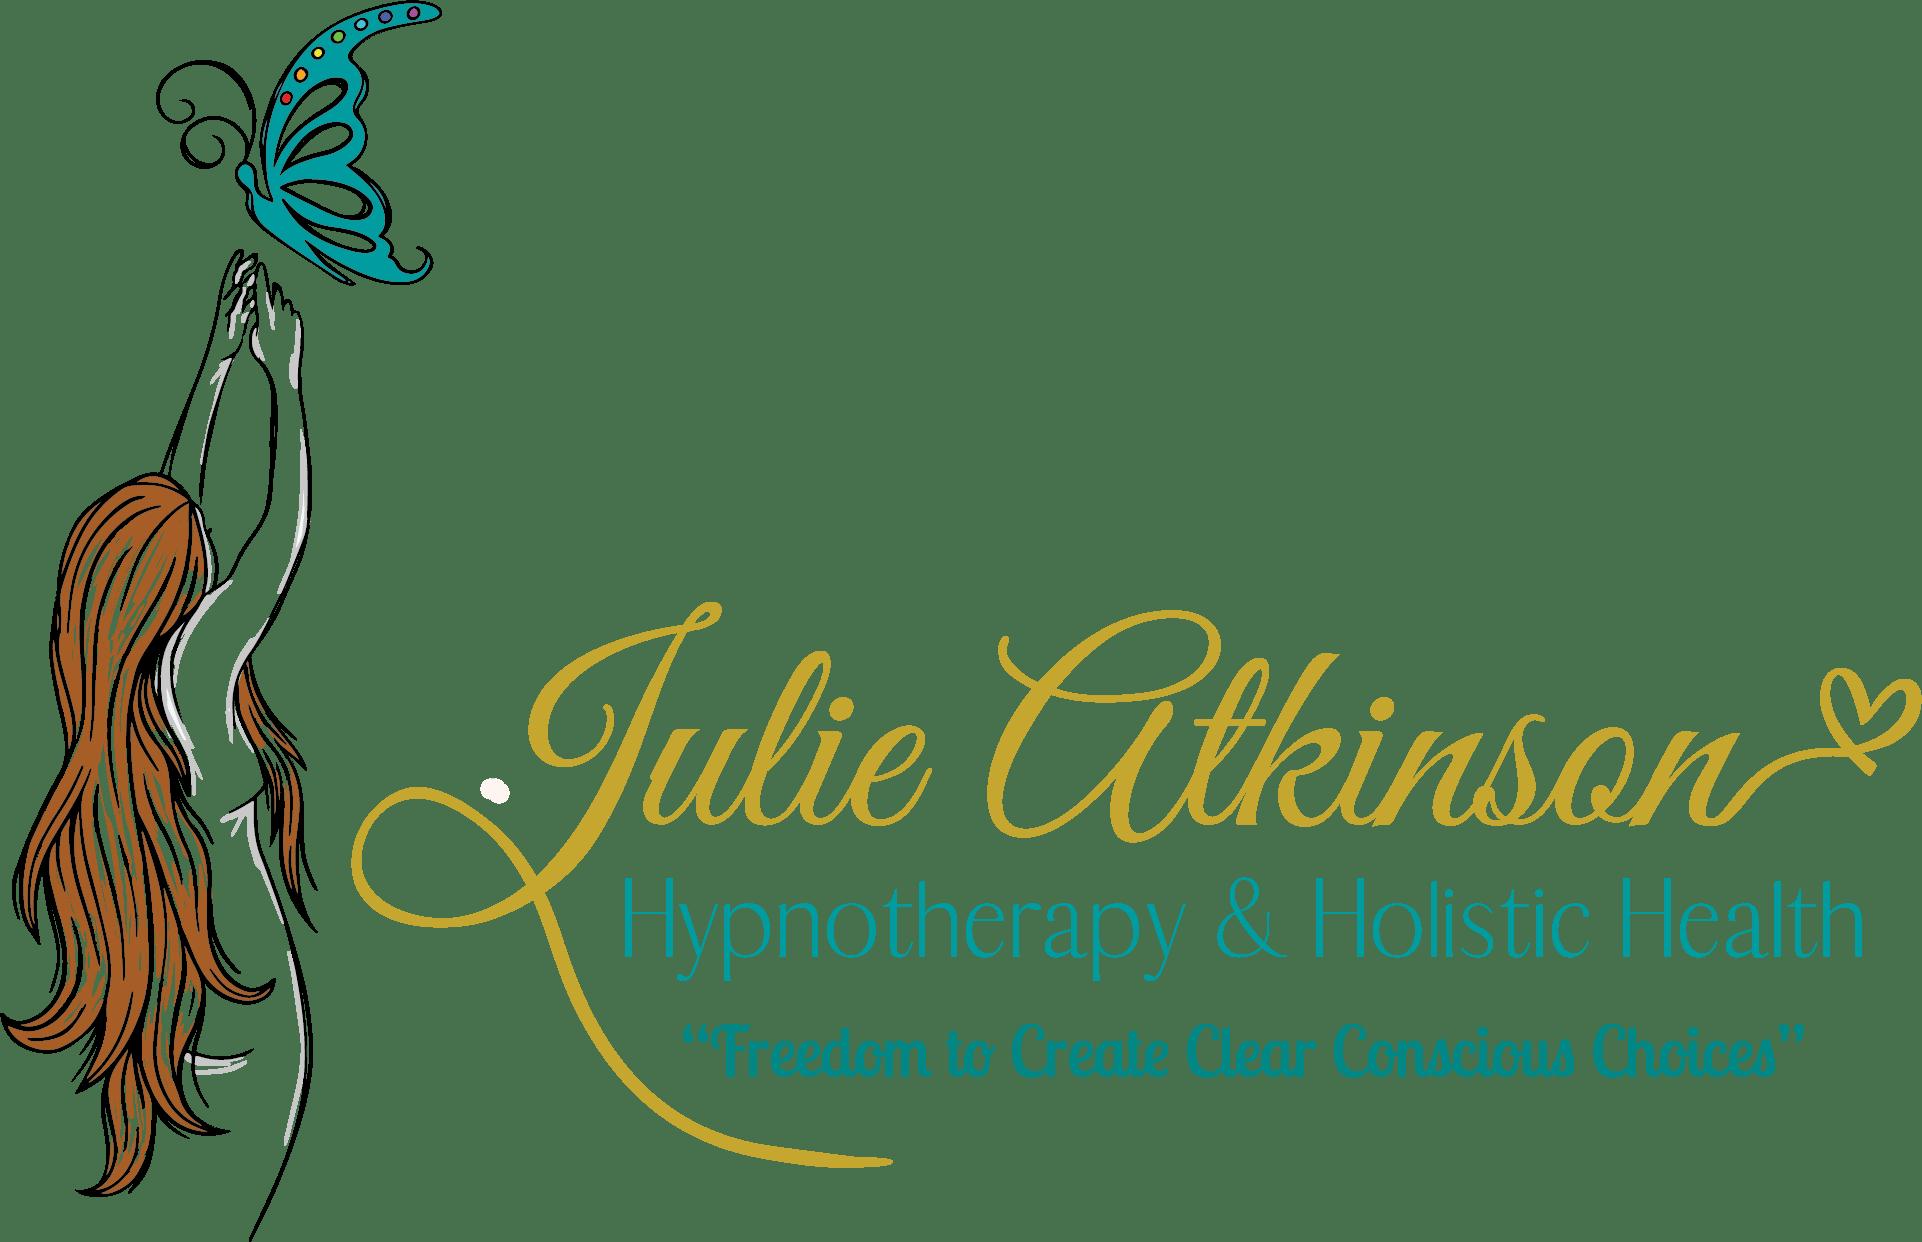 Julie Atkinson Hypnotherapy